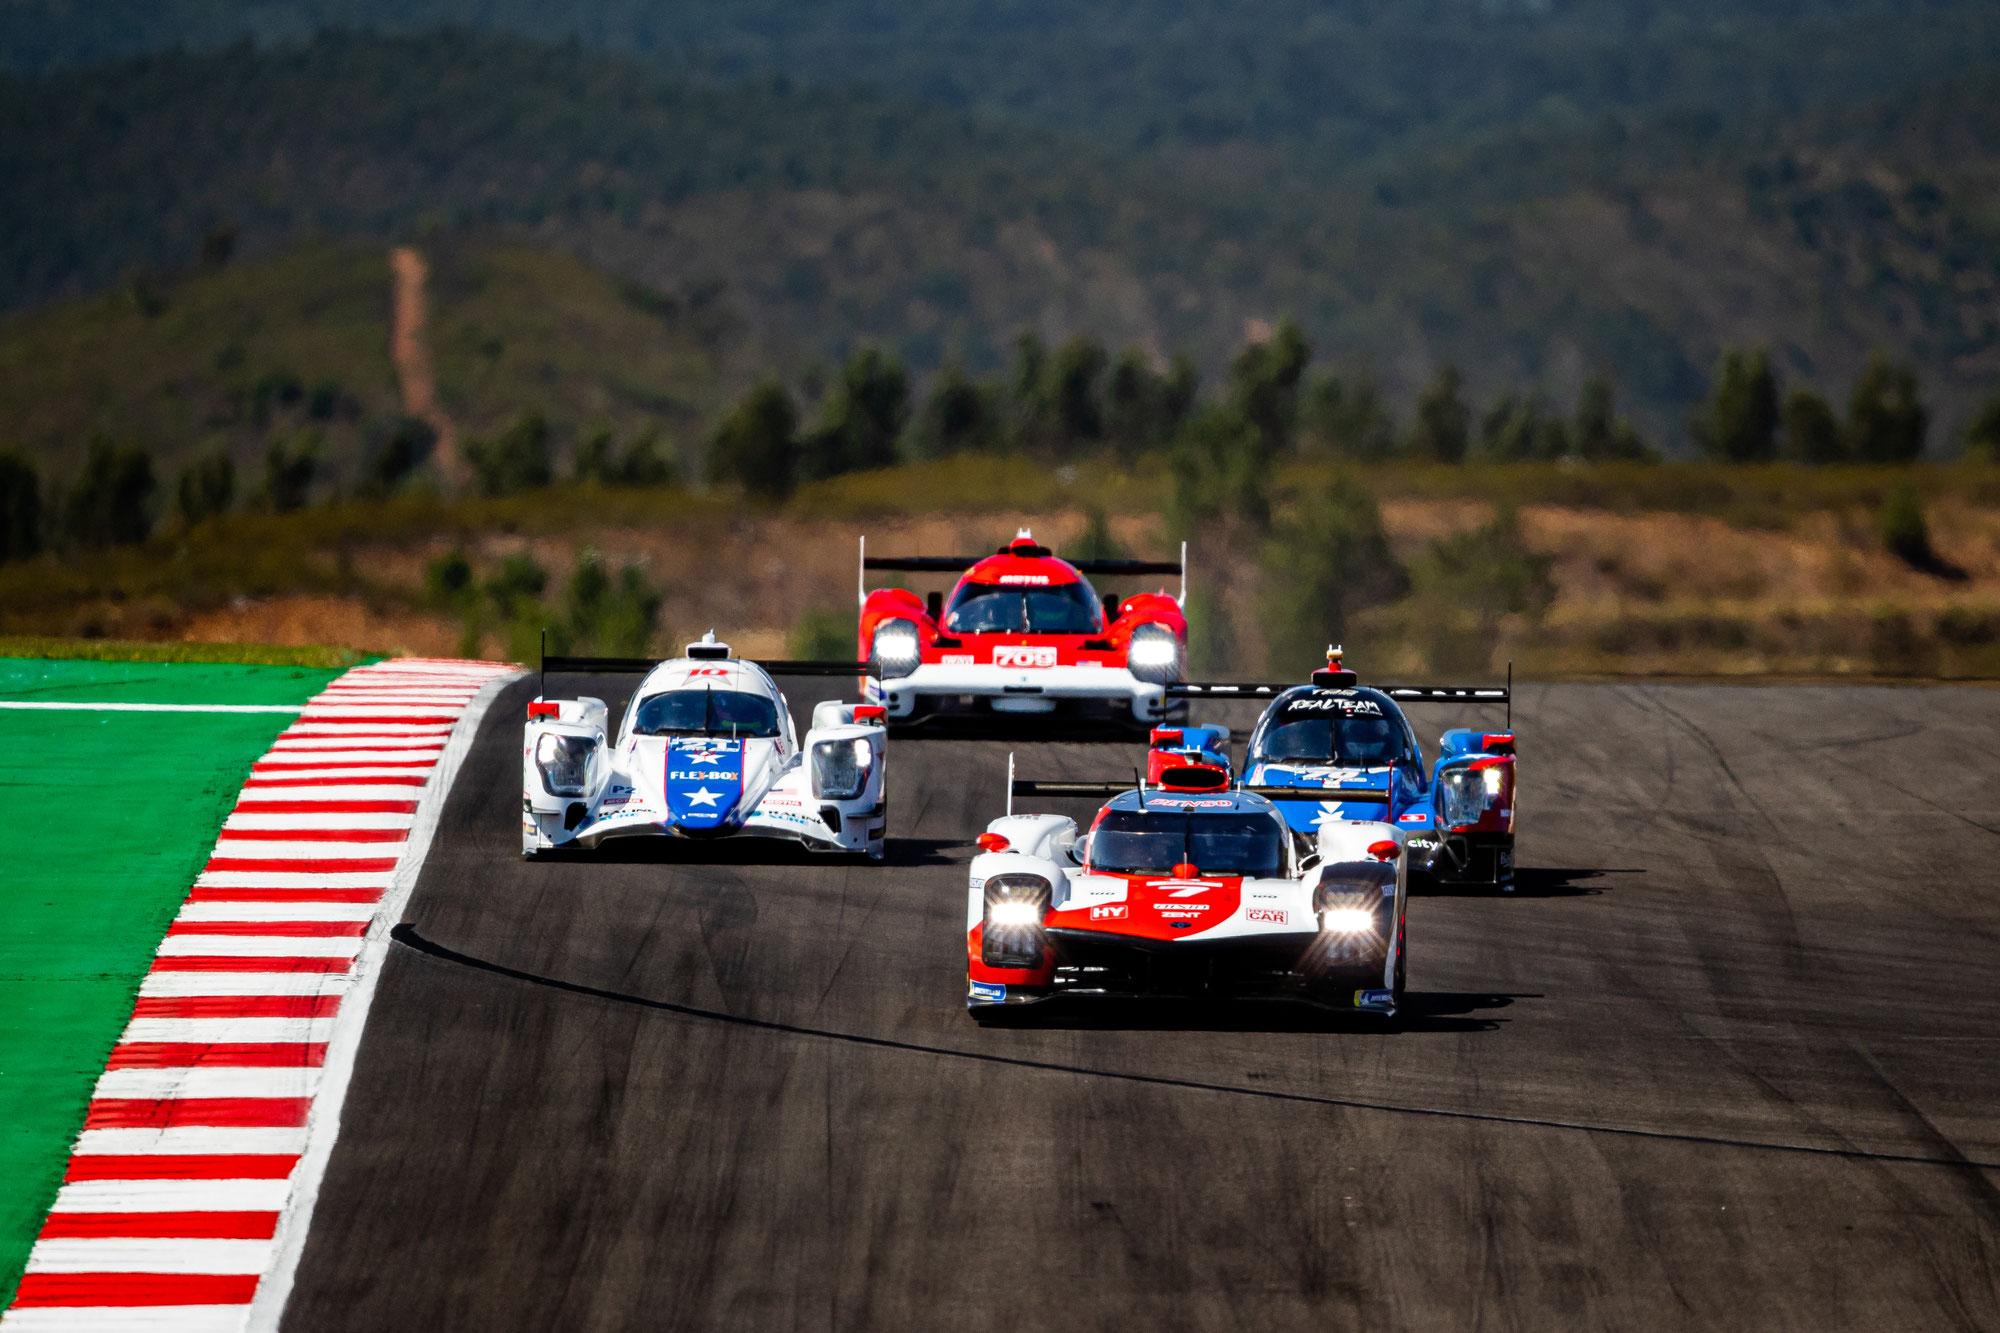 8h Portimão 6-Stunden-Bericht: Safety Car schließt Toyota/Alpine-Kampf ab